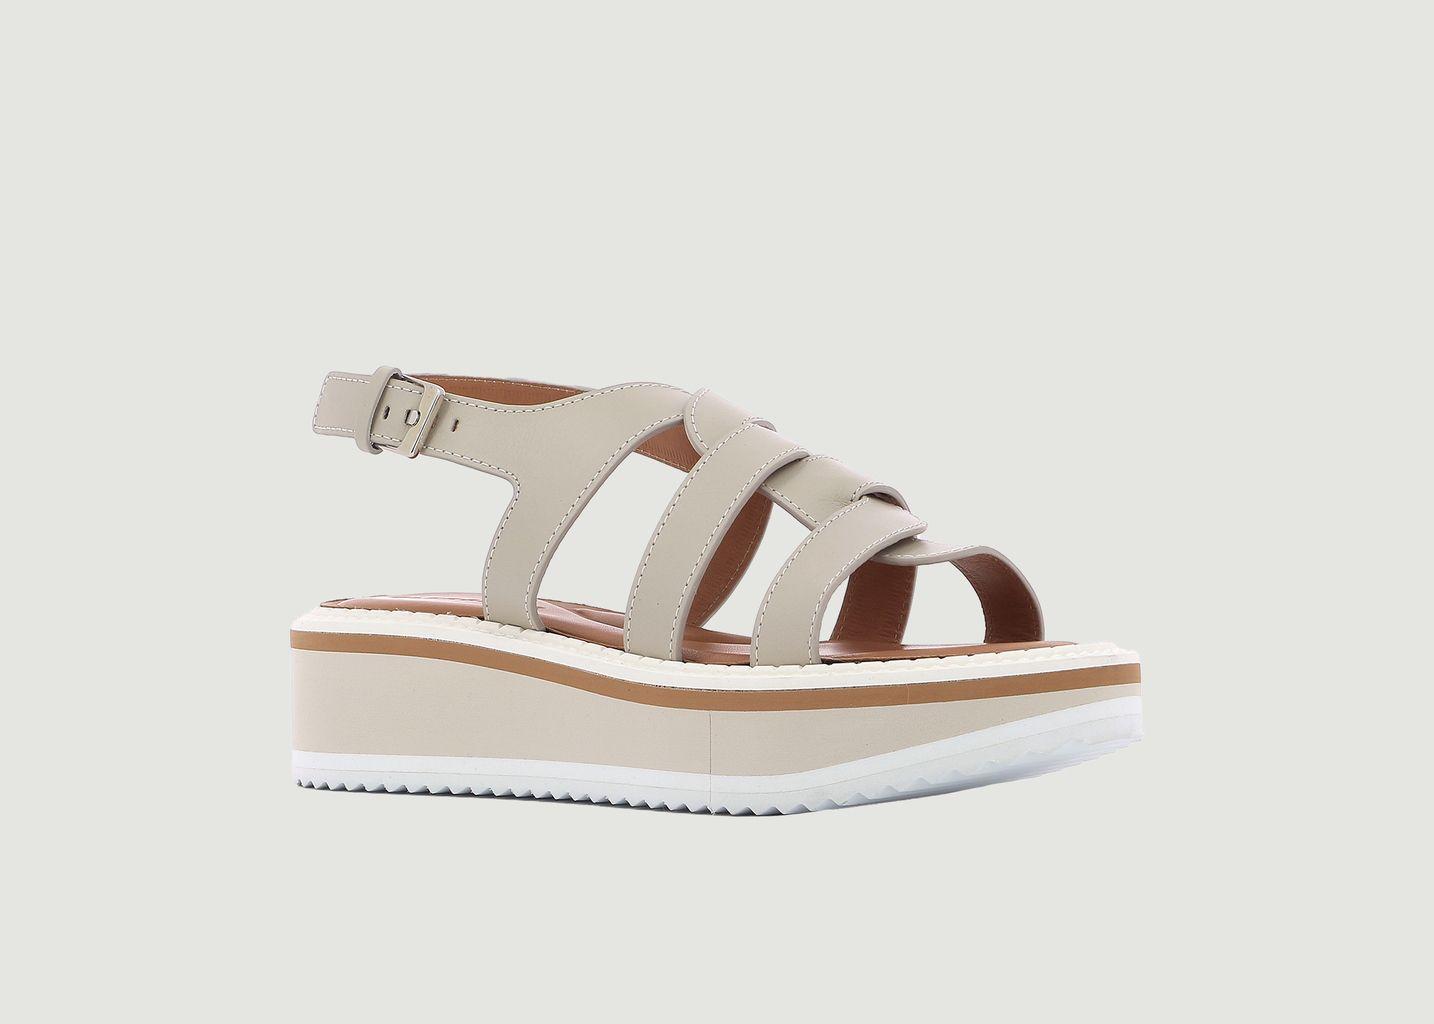 Sandale Filoe - Clergerie